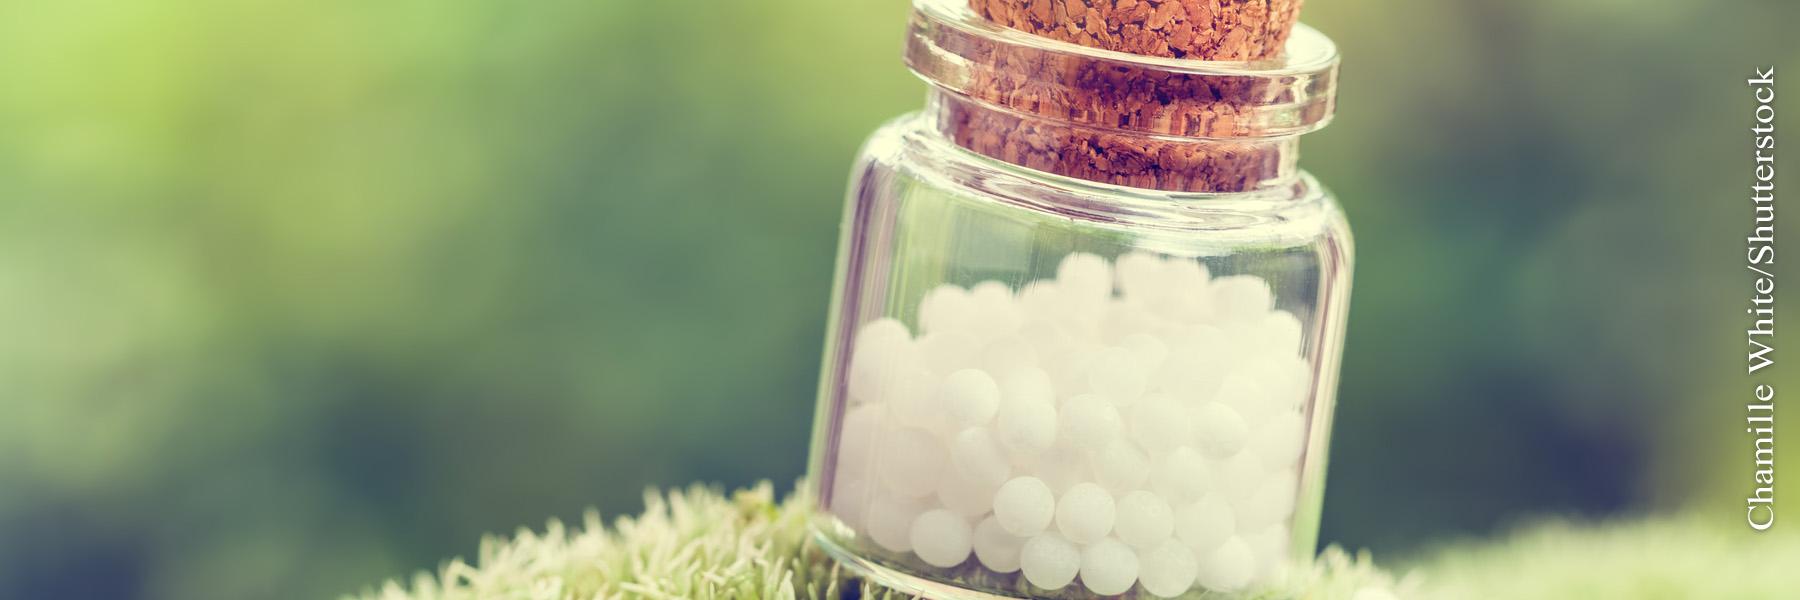 Homöopathie & Phytotherapie